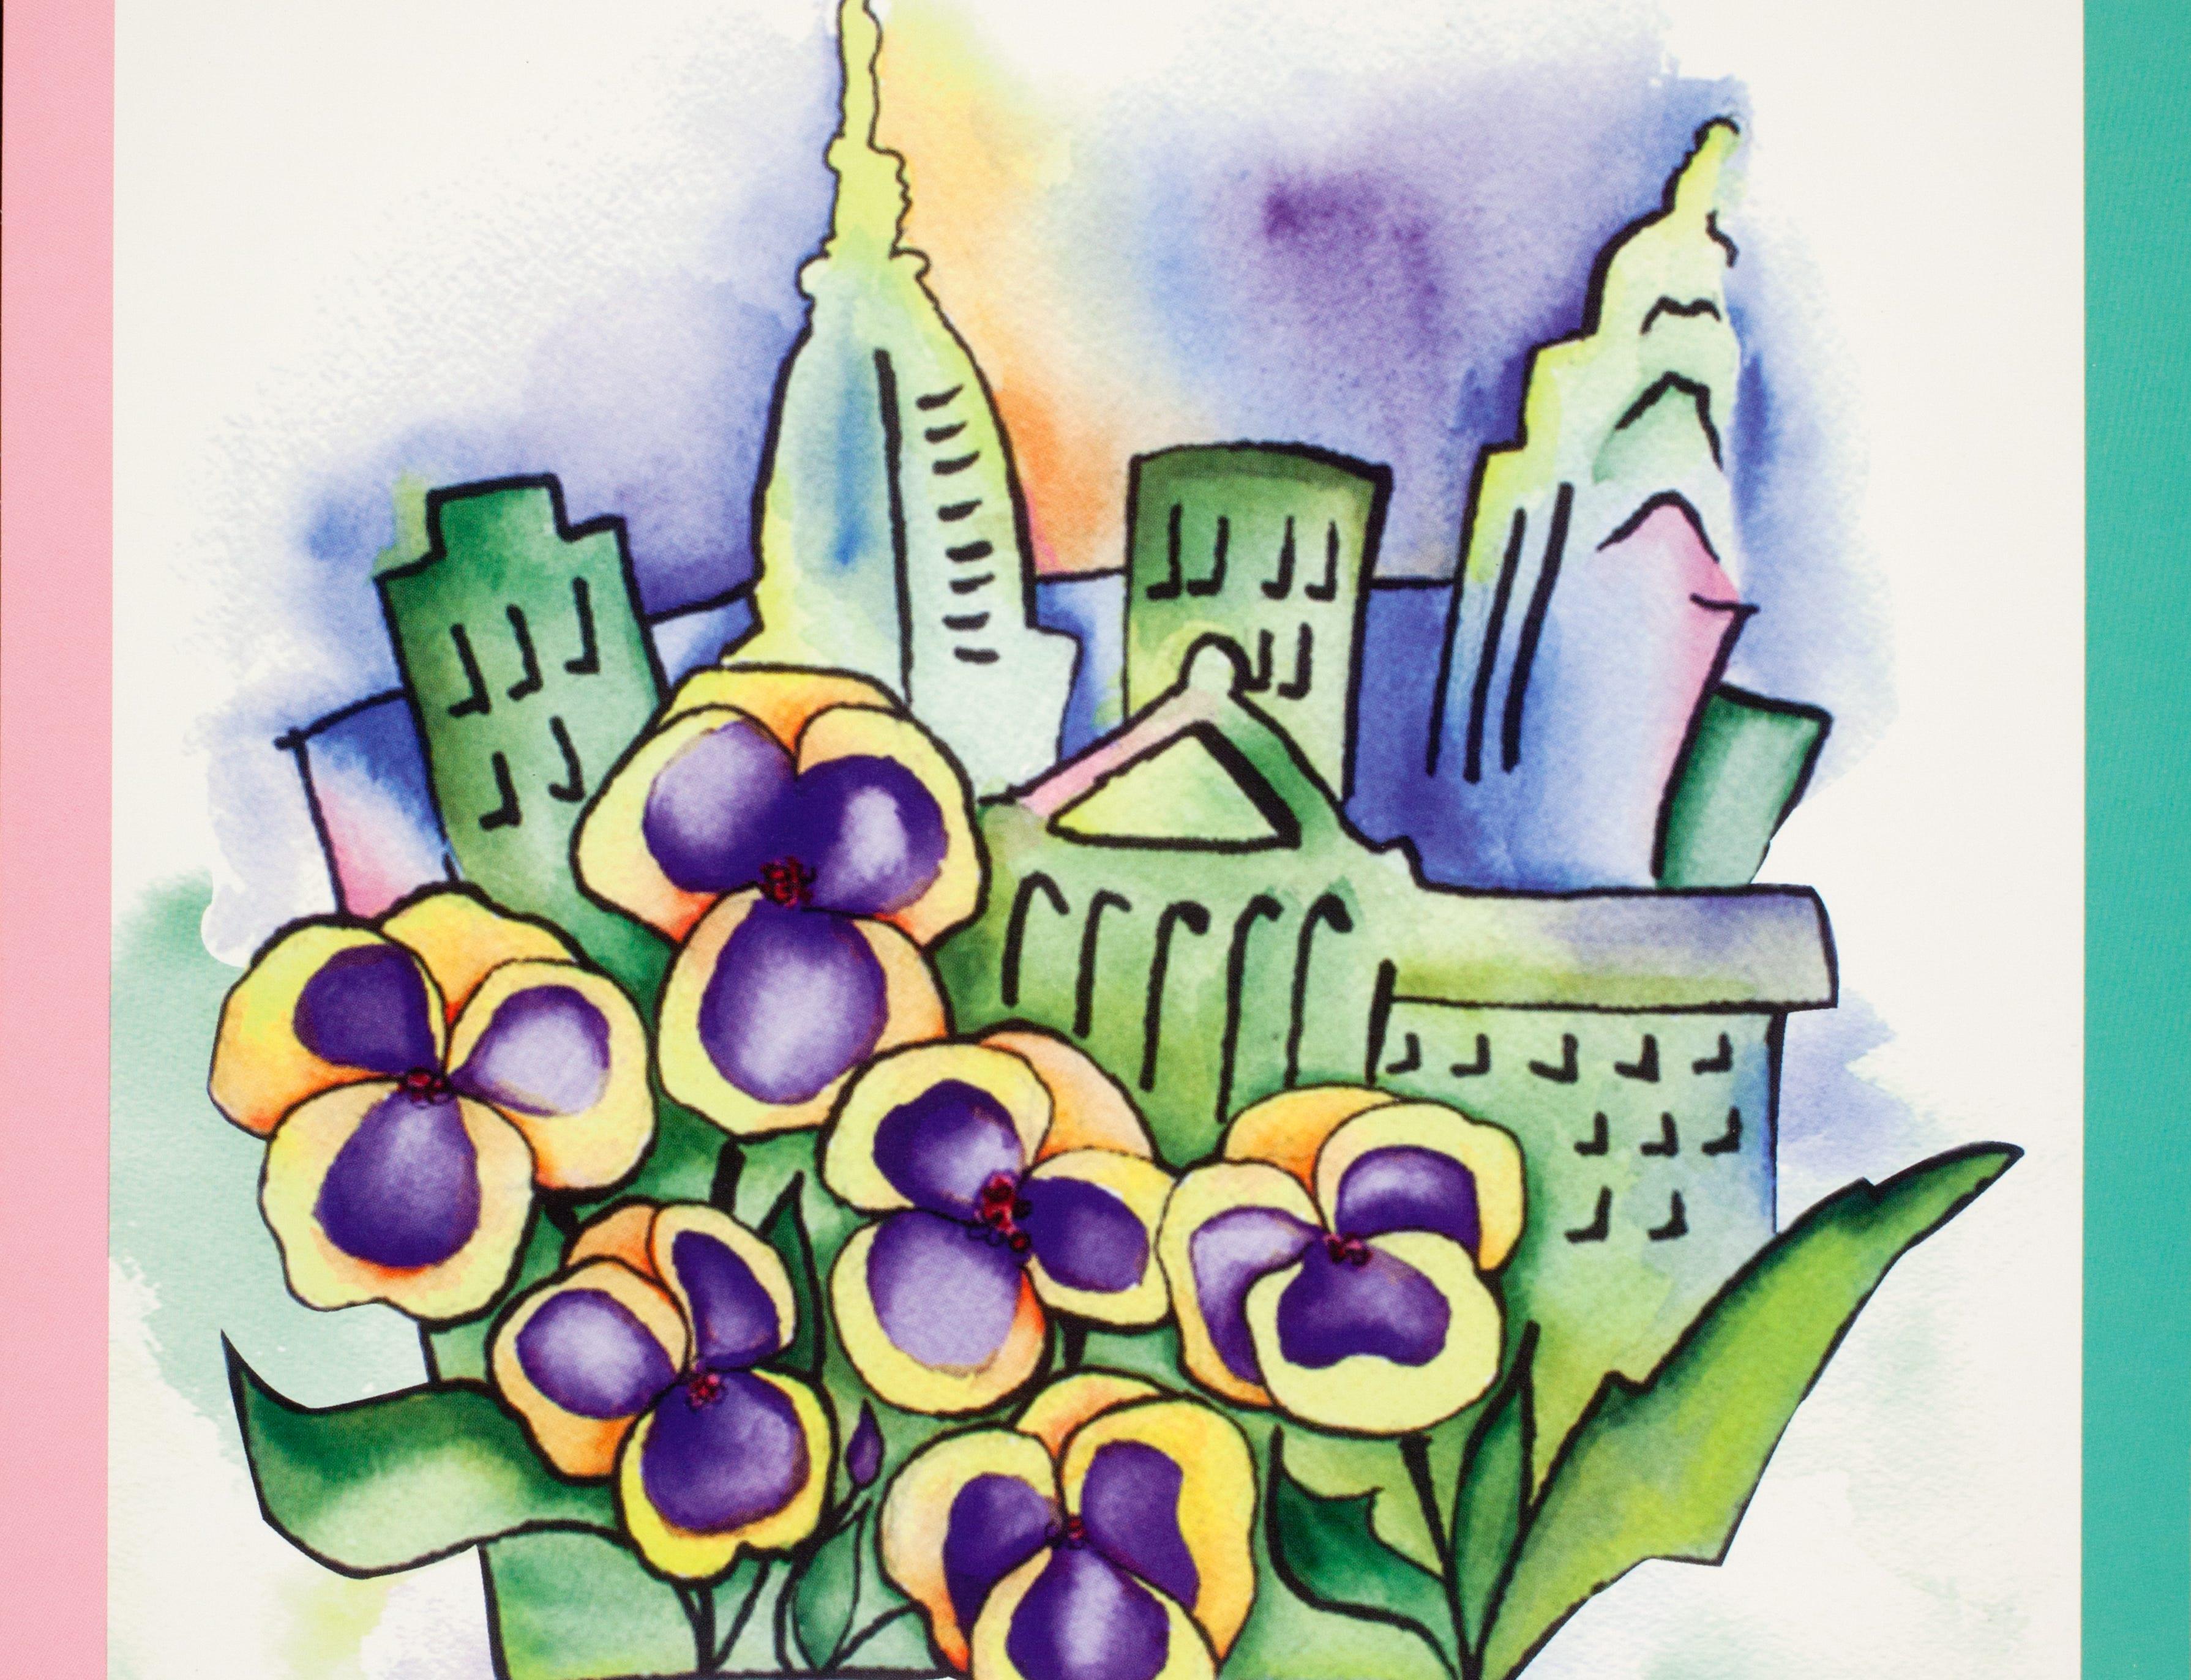 A poster for the 1996 Philadelphia Flower Show.